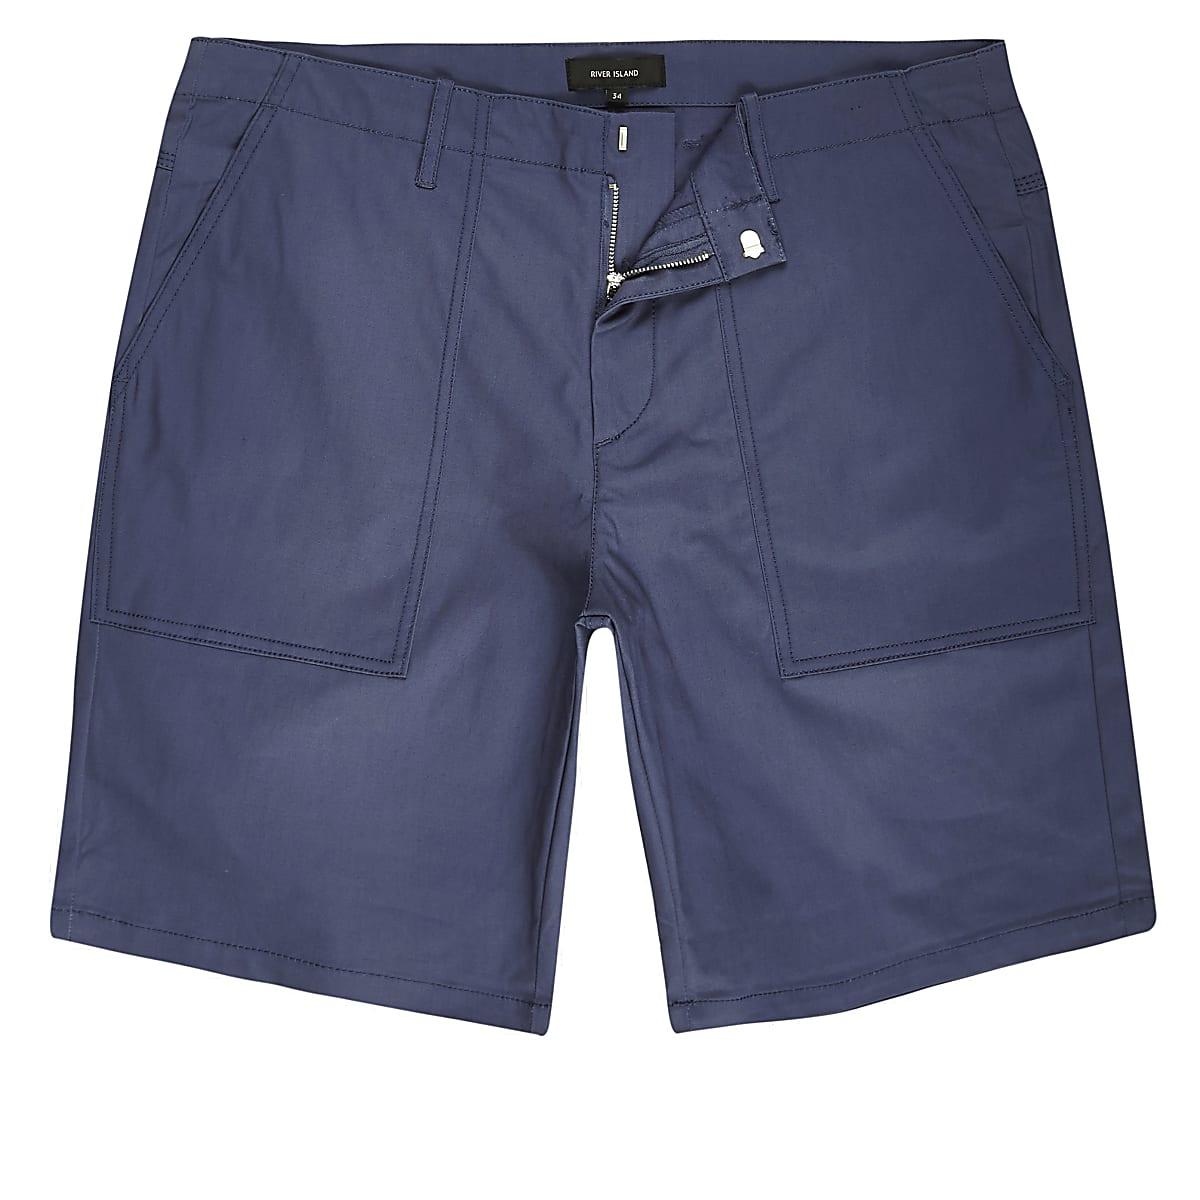 Blue smart slim fit chino shorts